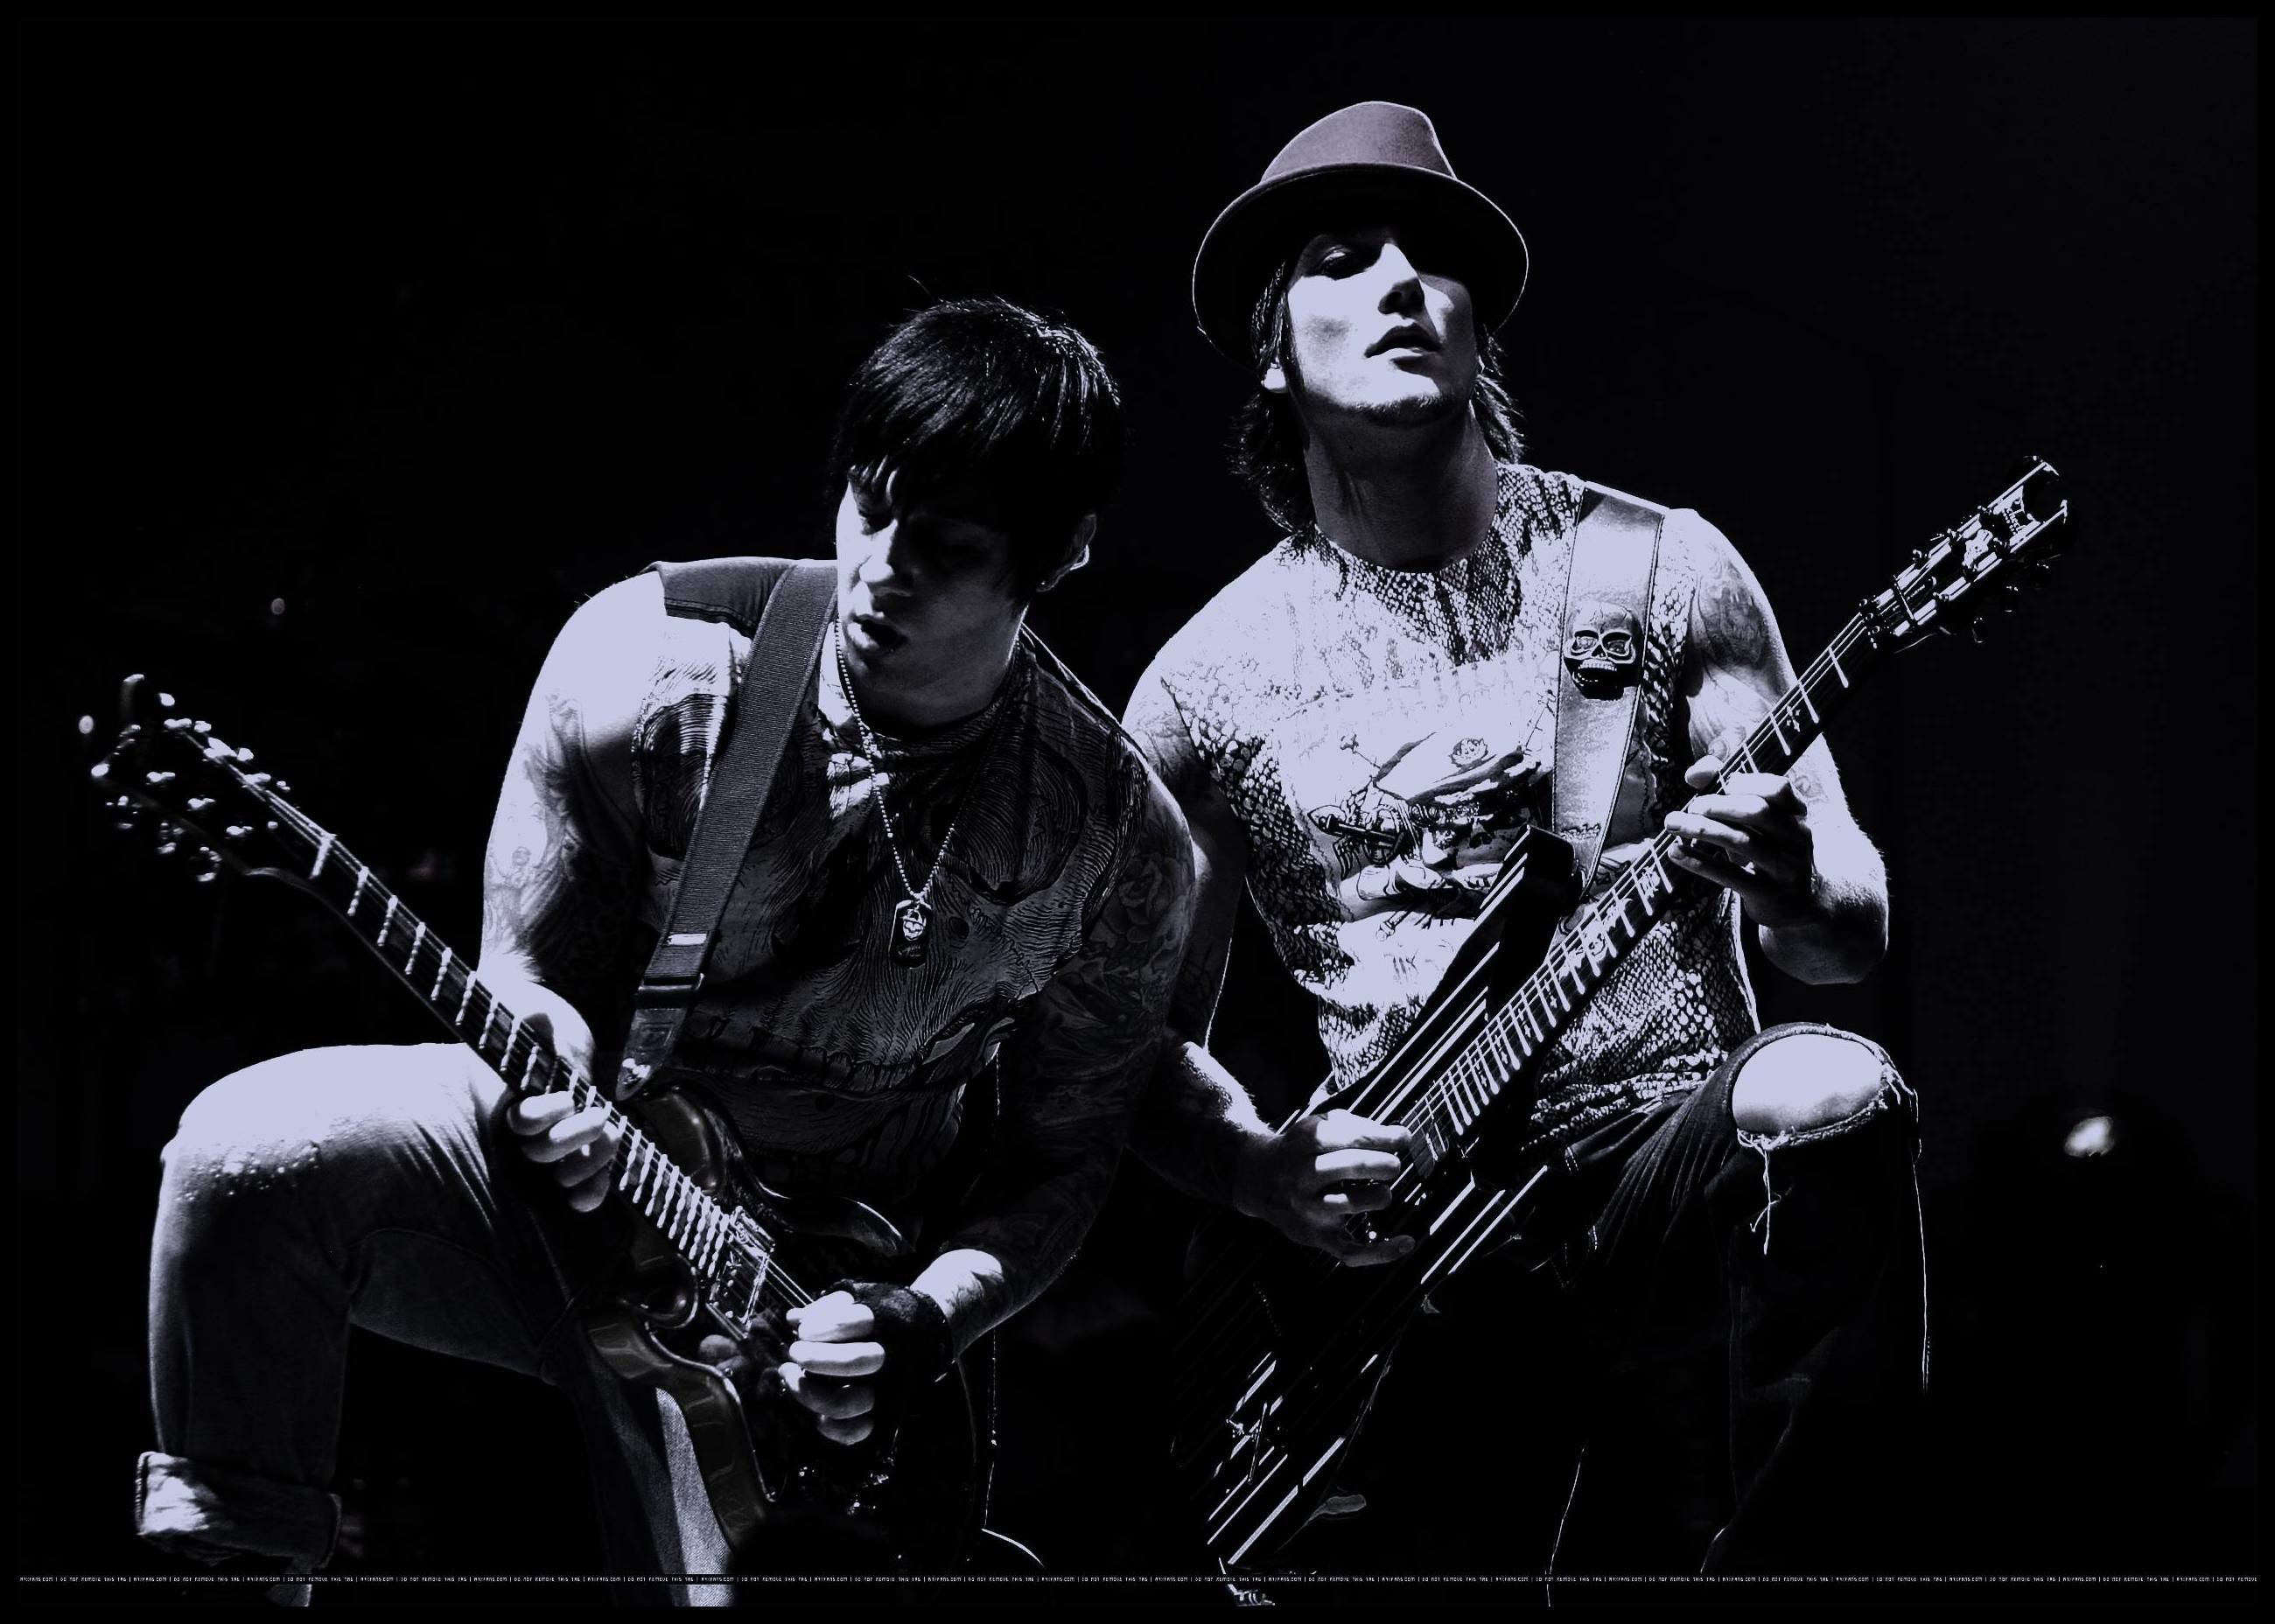 Avenged Sevenfold – Gotham HD Wallpaper – Hot Wallpapers HD